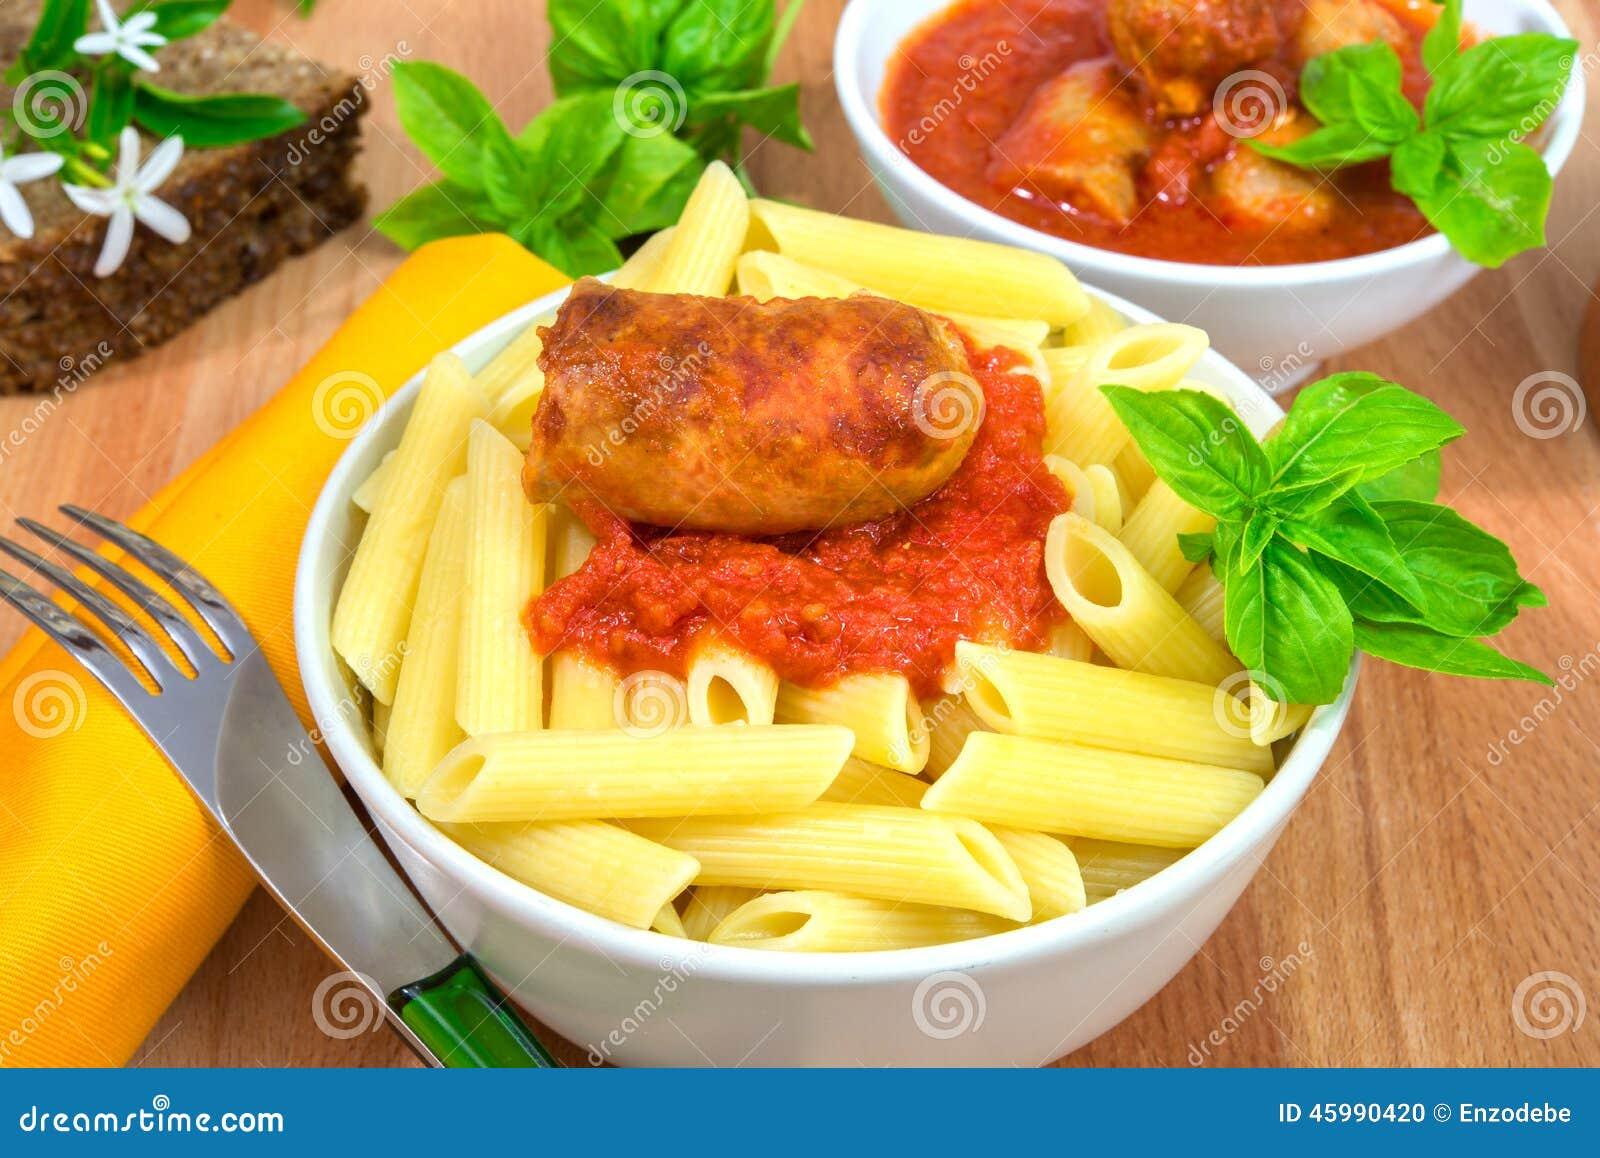 Rigatoni italian pasta with tomato ragu sausages sauce.